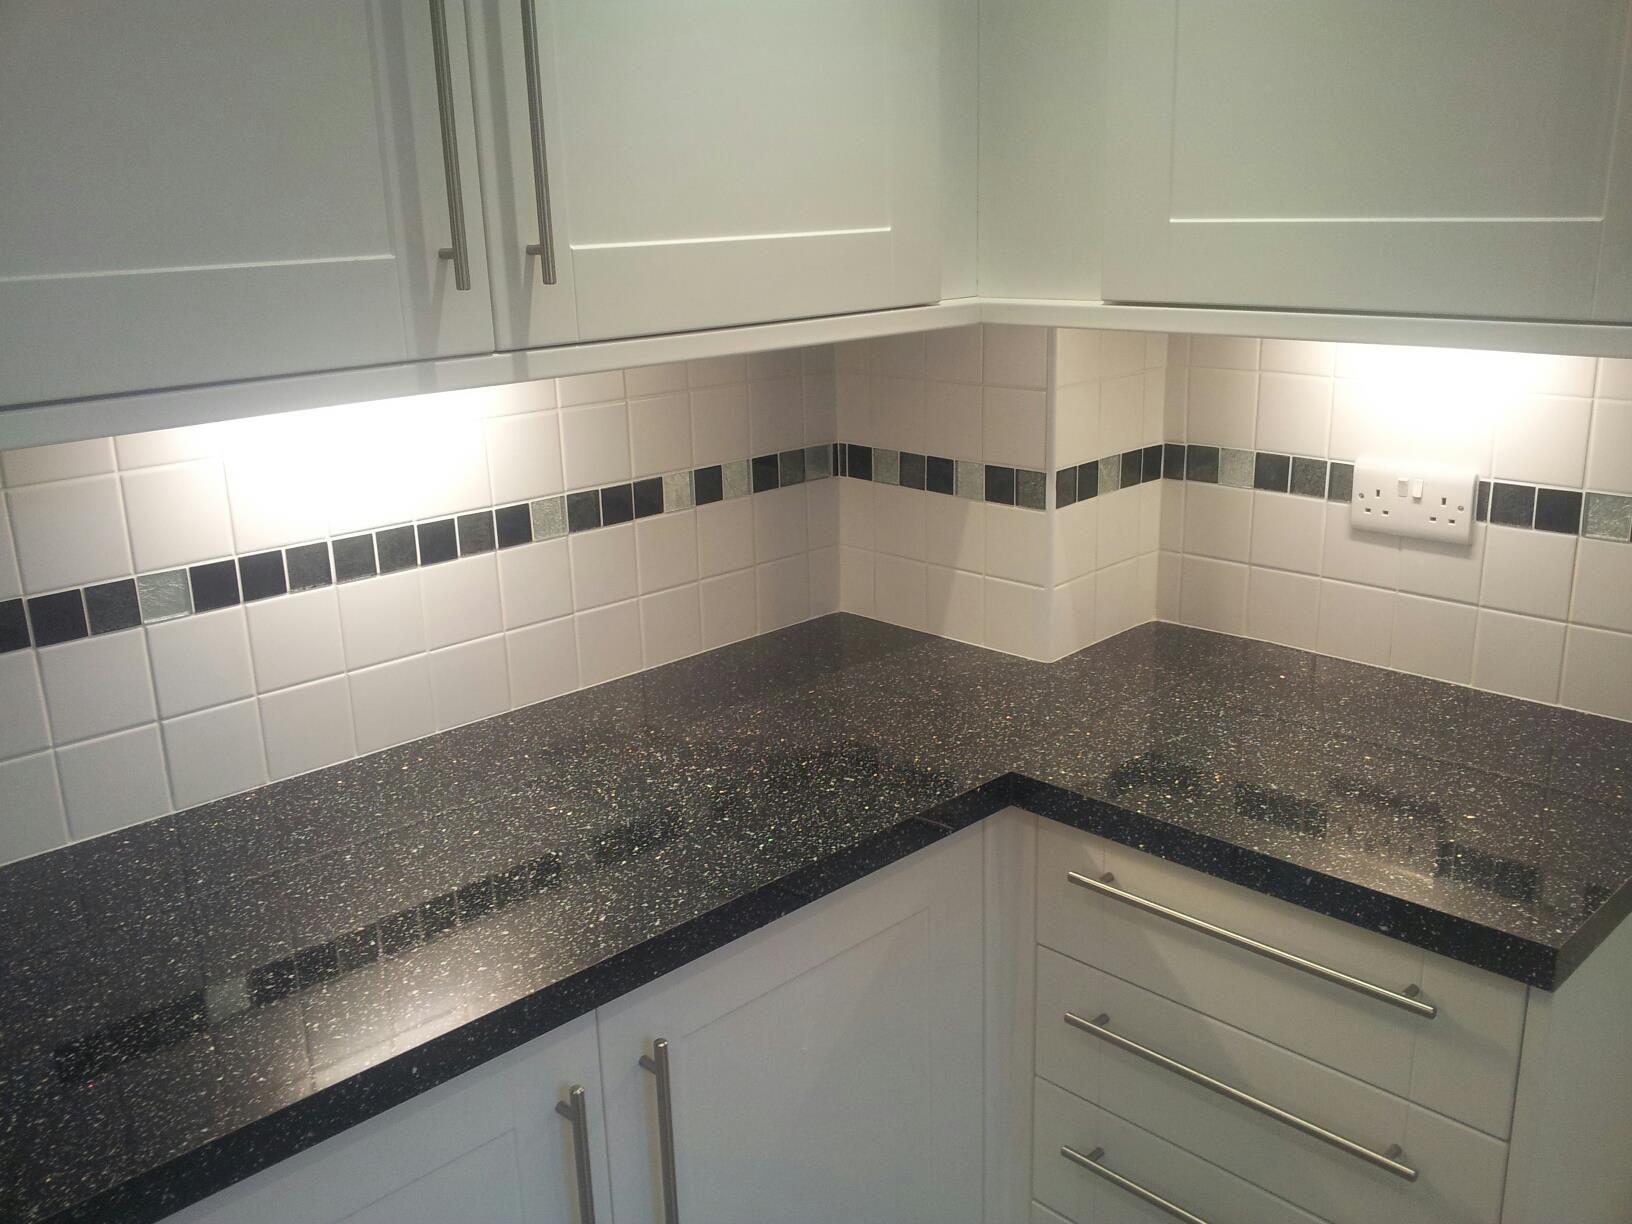 Kitchen Backsplash Kitchen Wall Tiles Design Ideas